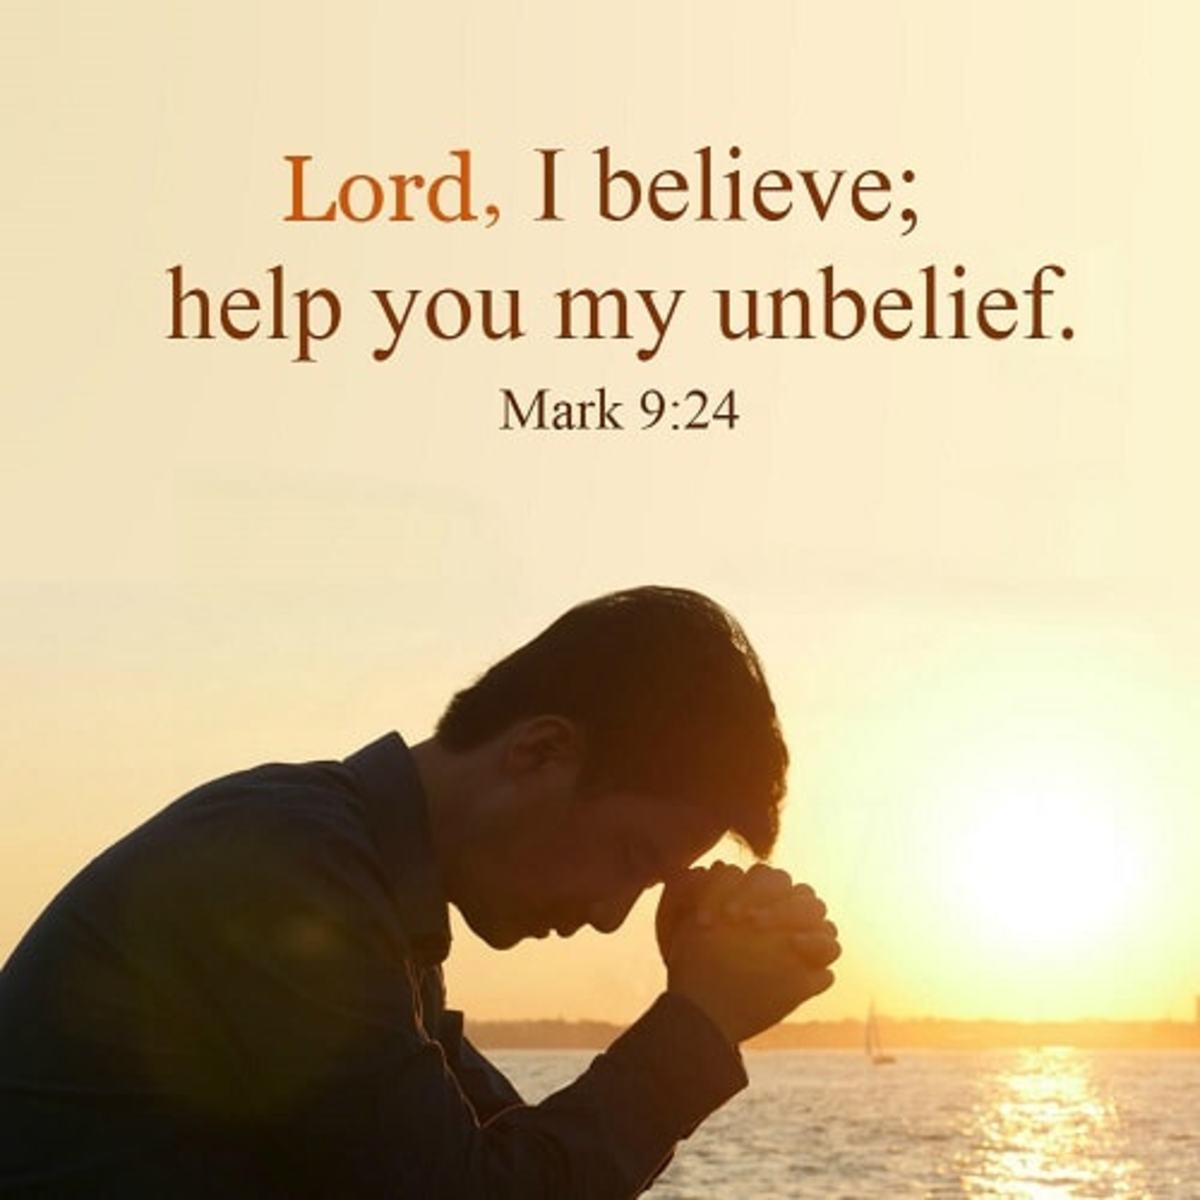 help-my-unbelief-a-study-of-mark-914-29